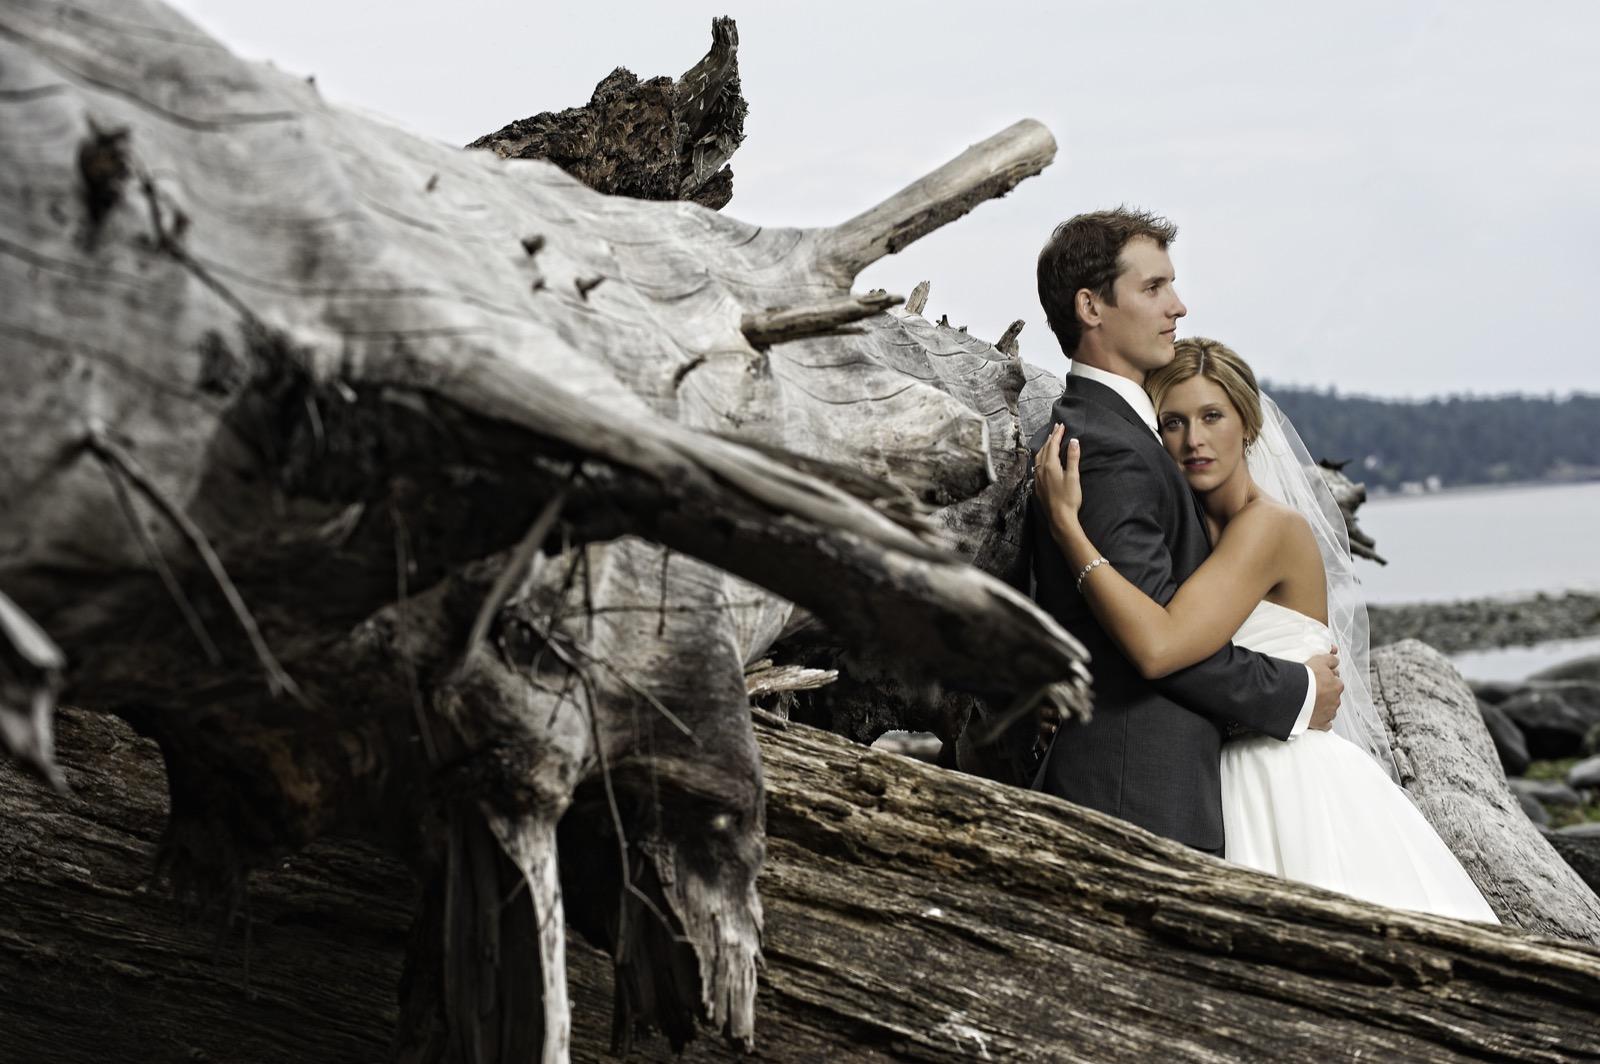 sooke-wedding-photographers-craidelonna-oceanedge-lodge-wedding-75.jpg